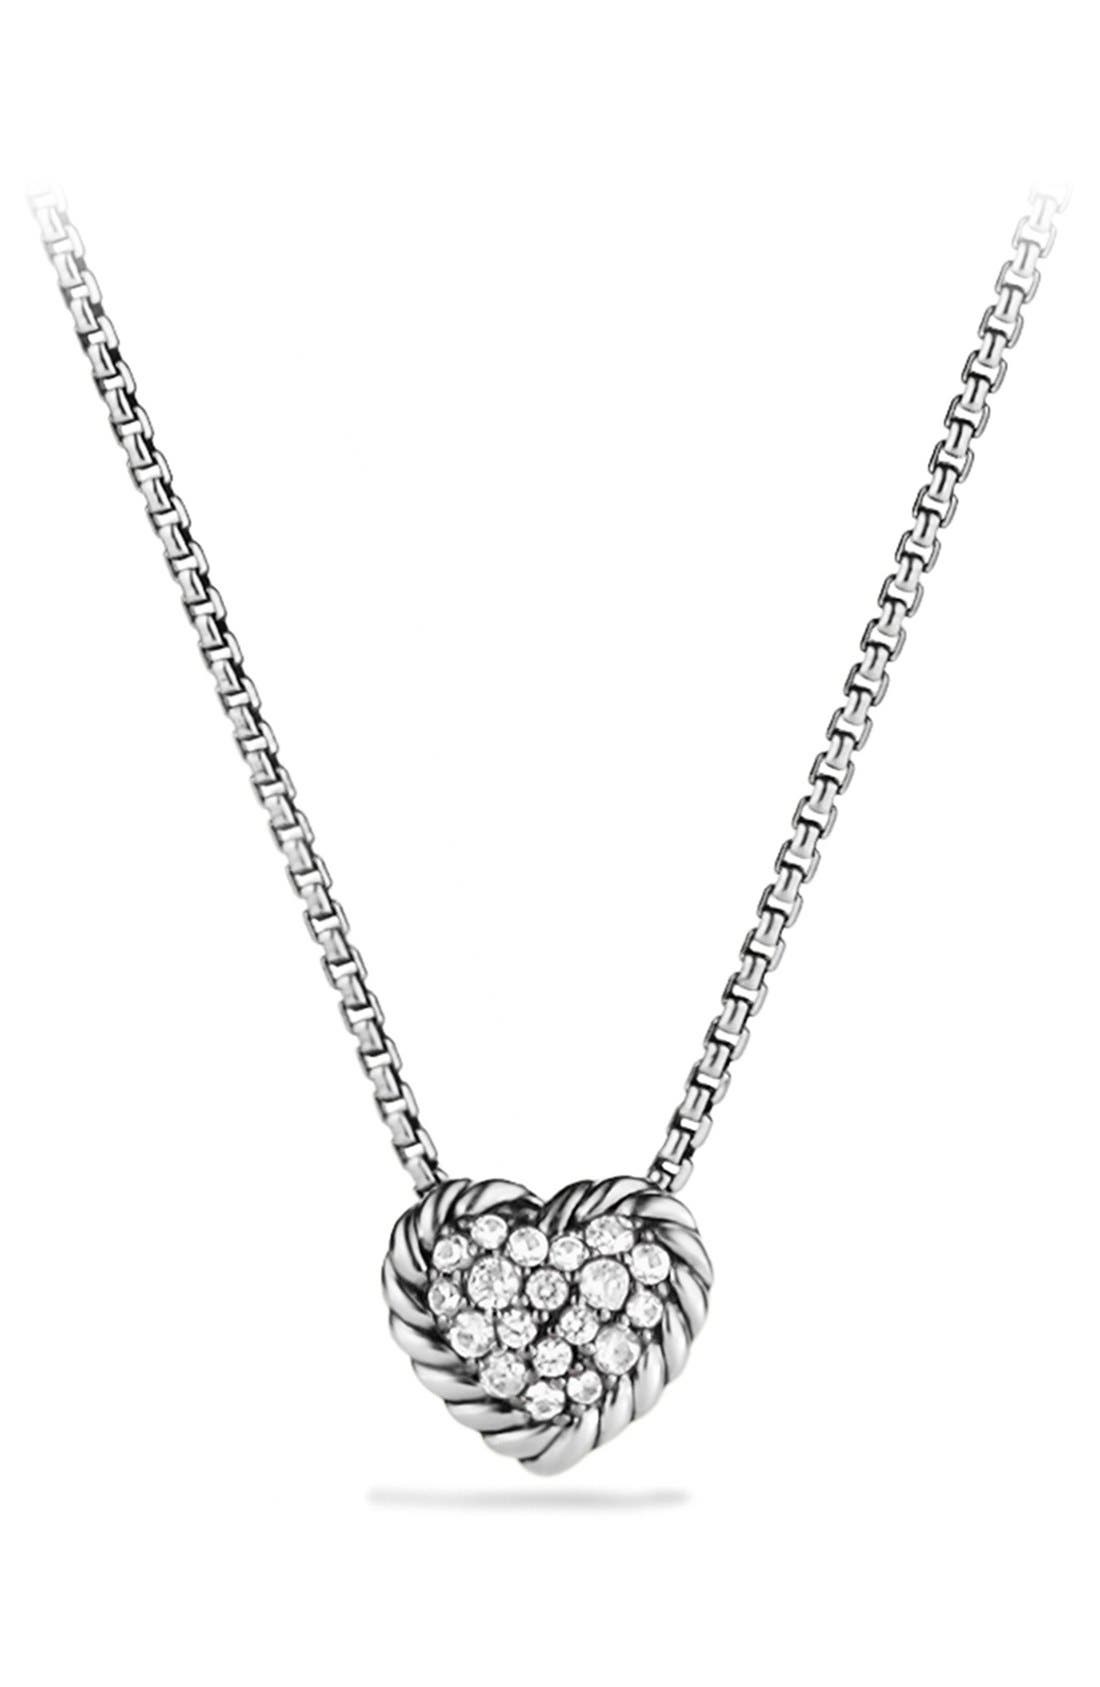 David Yurman 'Châtelaine' Heart Pendant Necklace with Diamonds